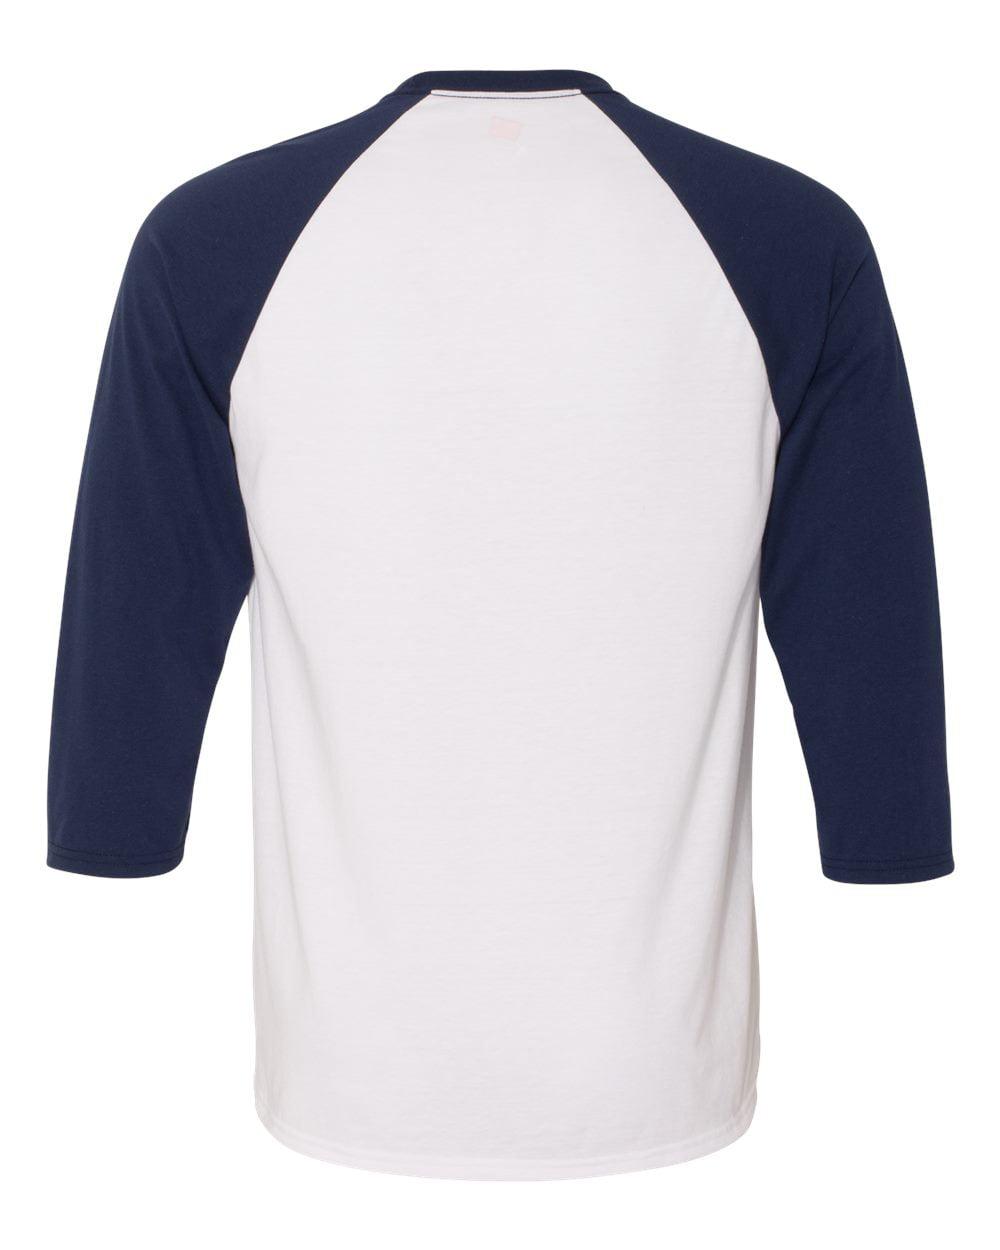 Hanes - X-Temp 3/4 Sleeve Baseball T Shirt - Walmart.com